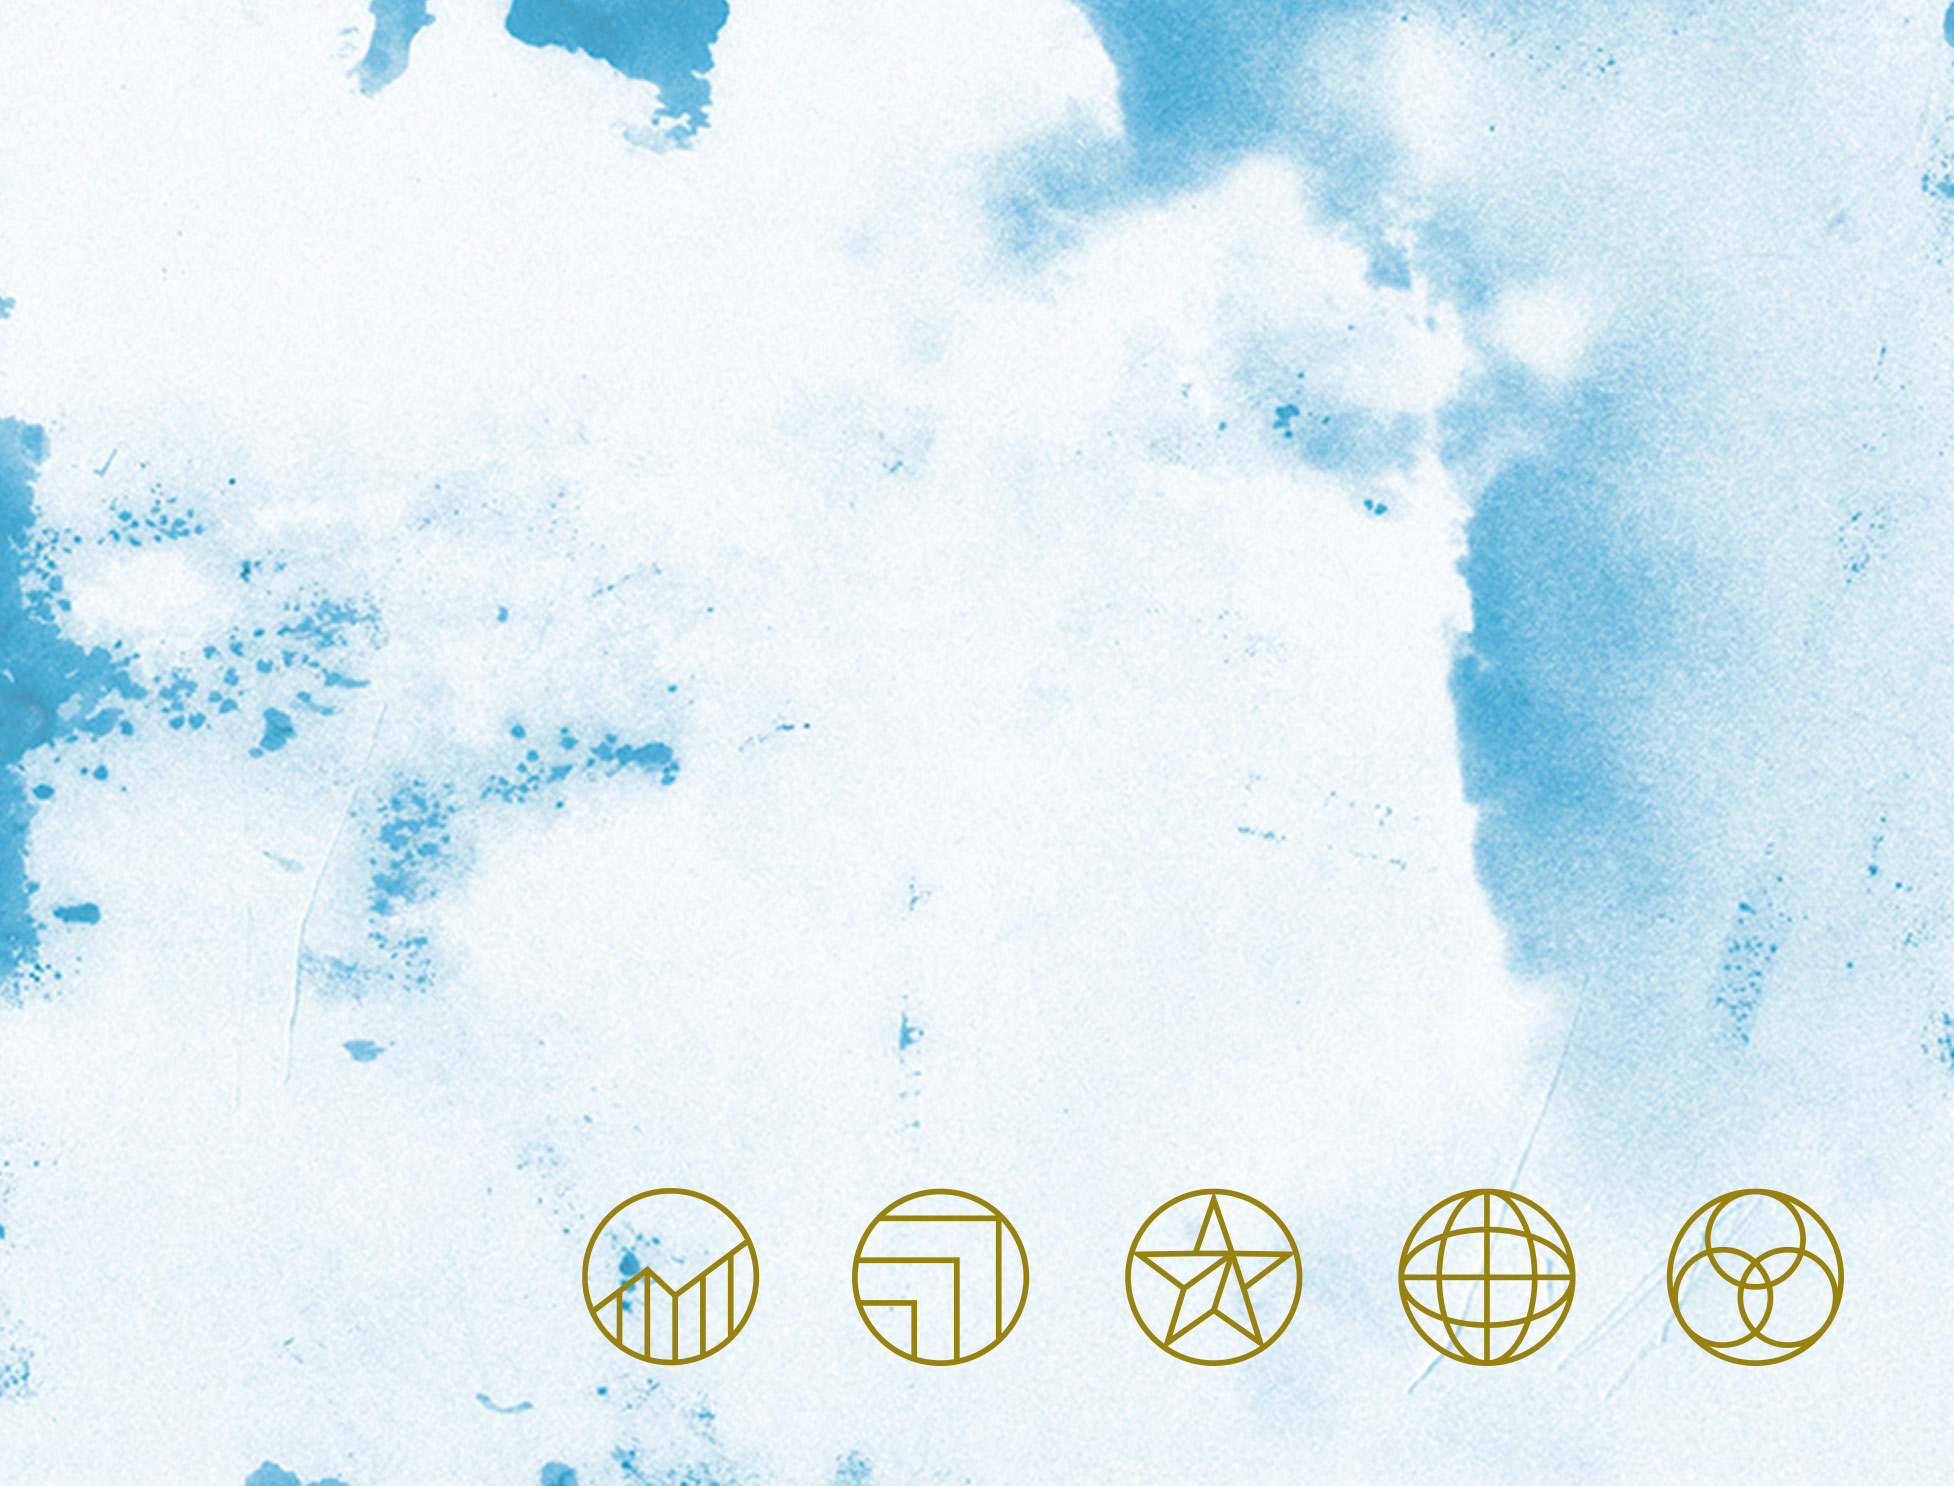 Work_UNC_report_cloudicons